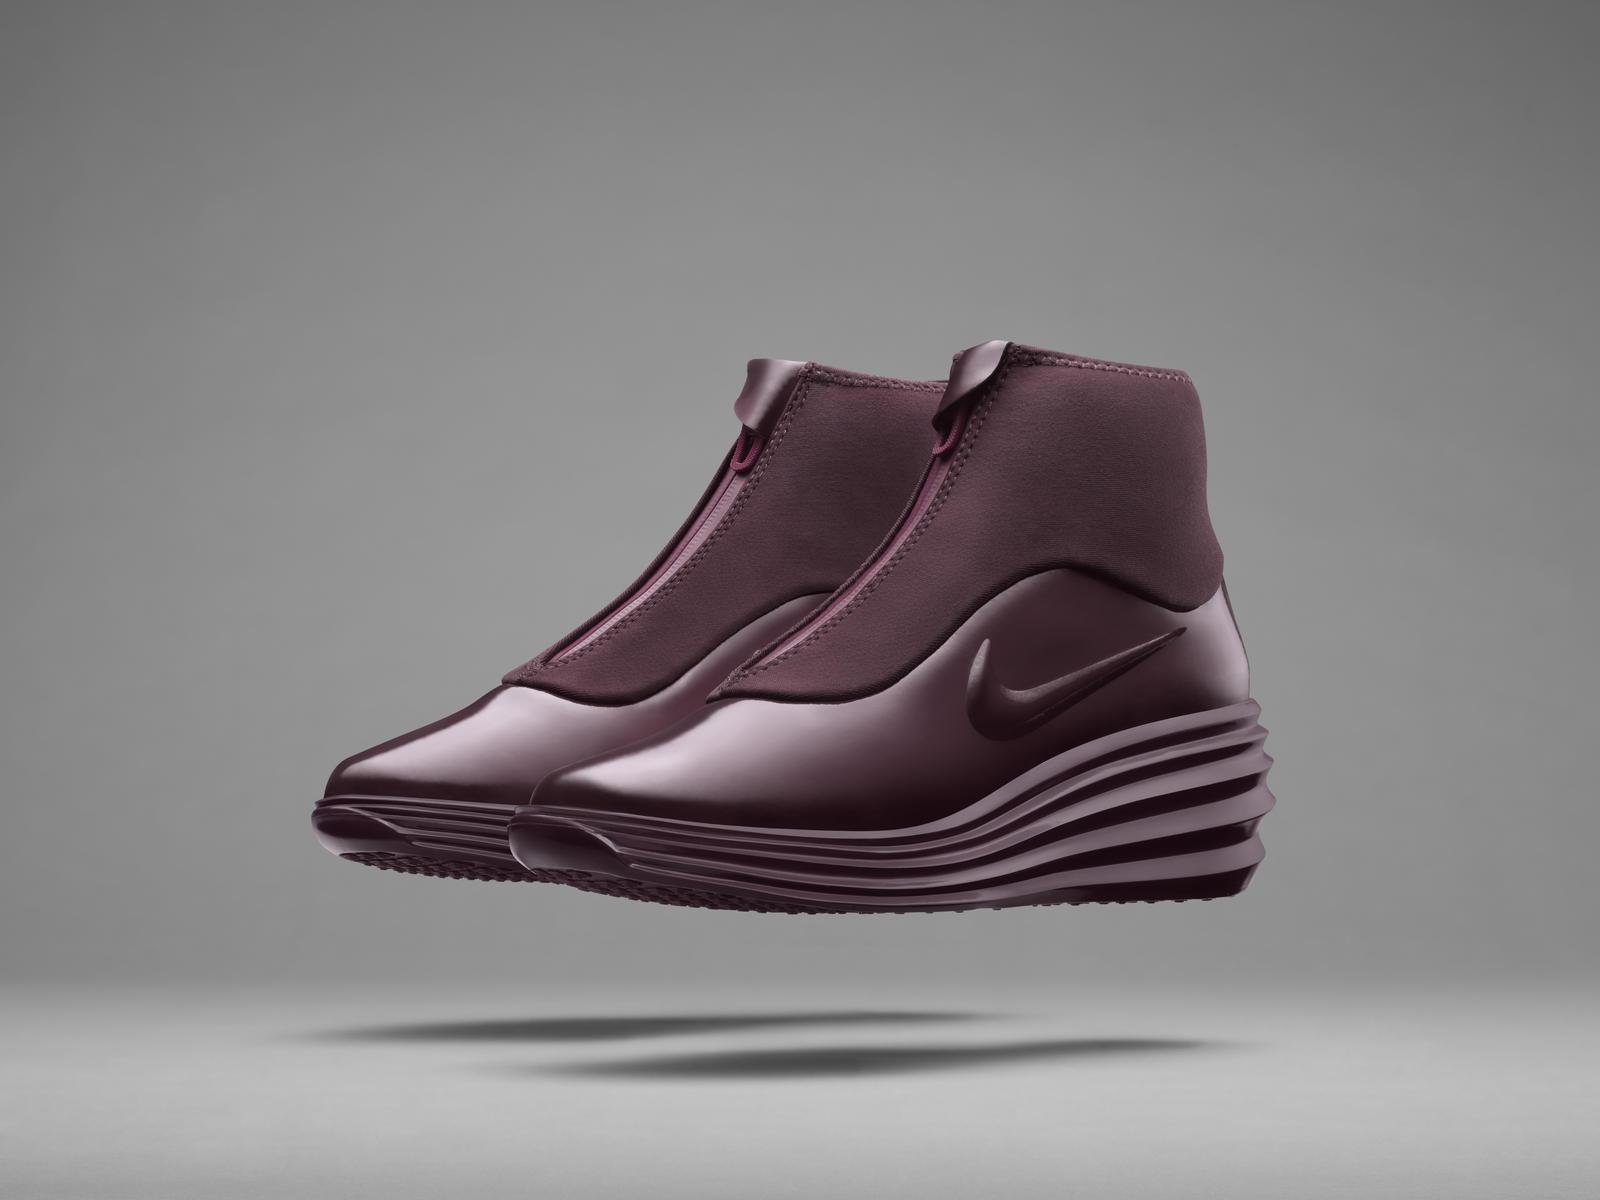 nike lunarelite sky hi sneakerboot nike news. Black Bedroom Furniture Sets. Home Design Ideas